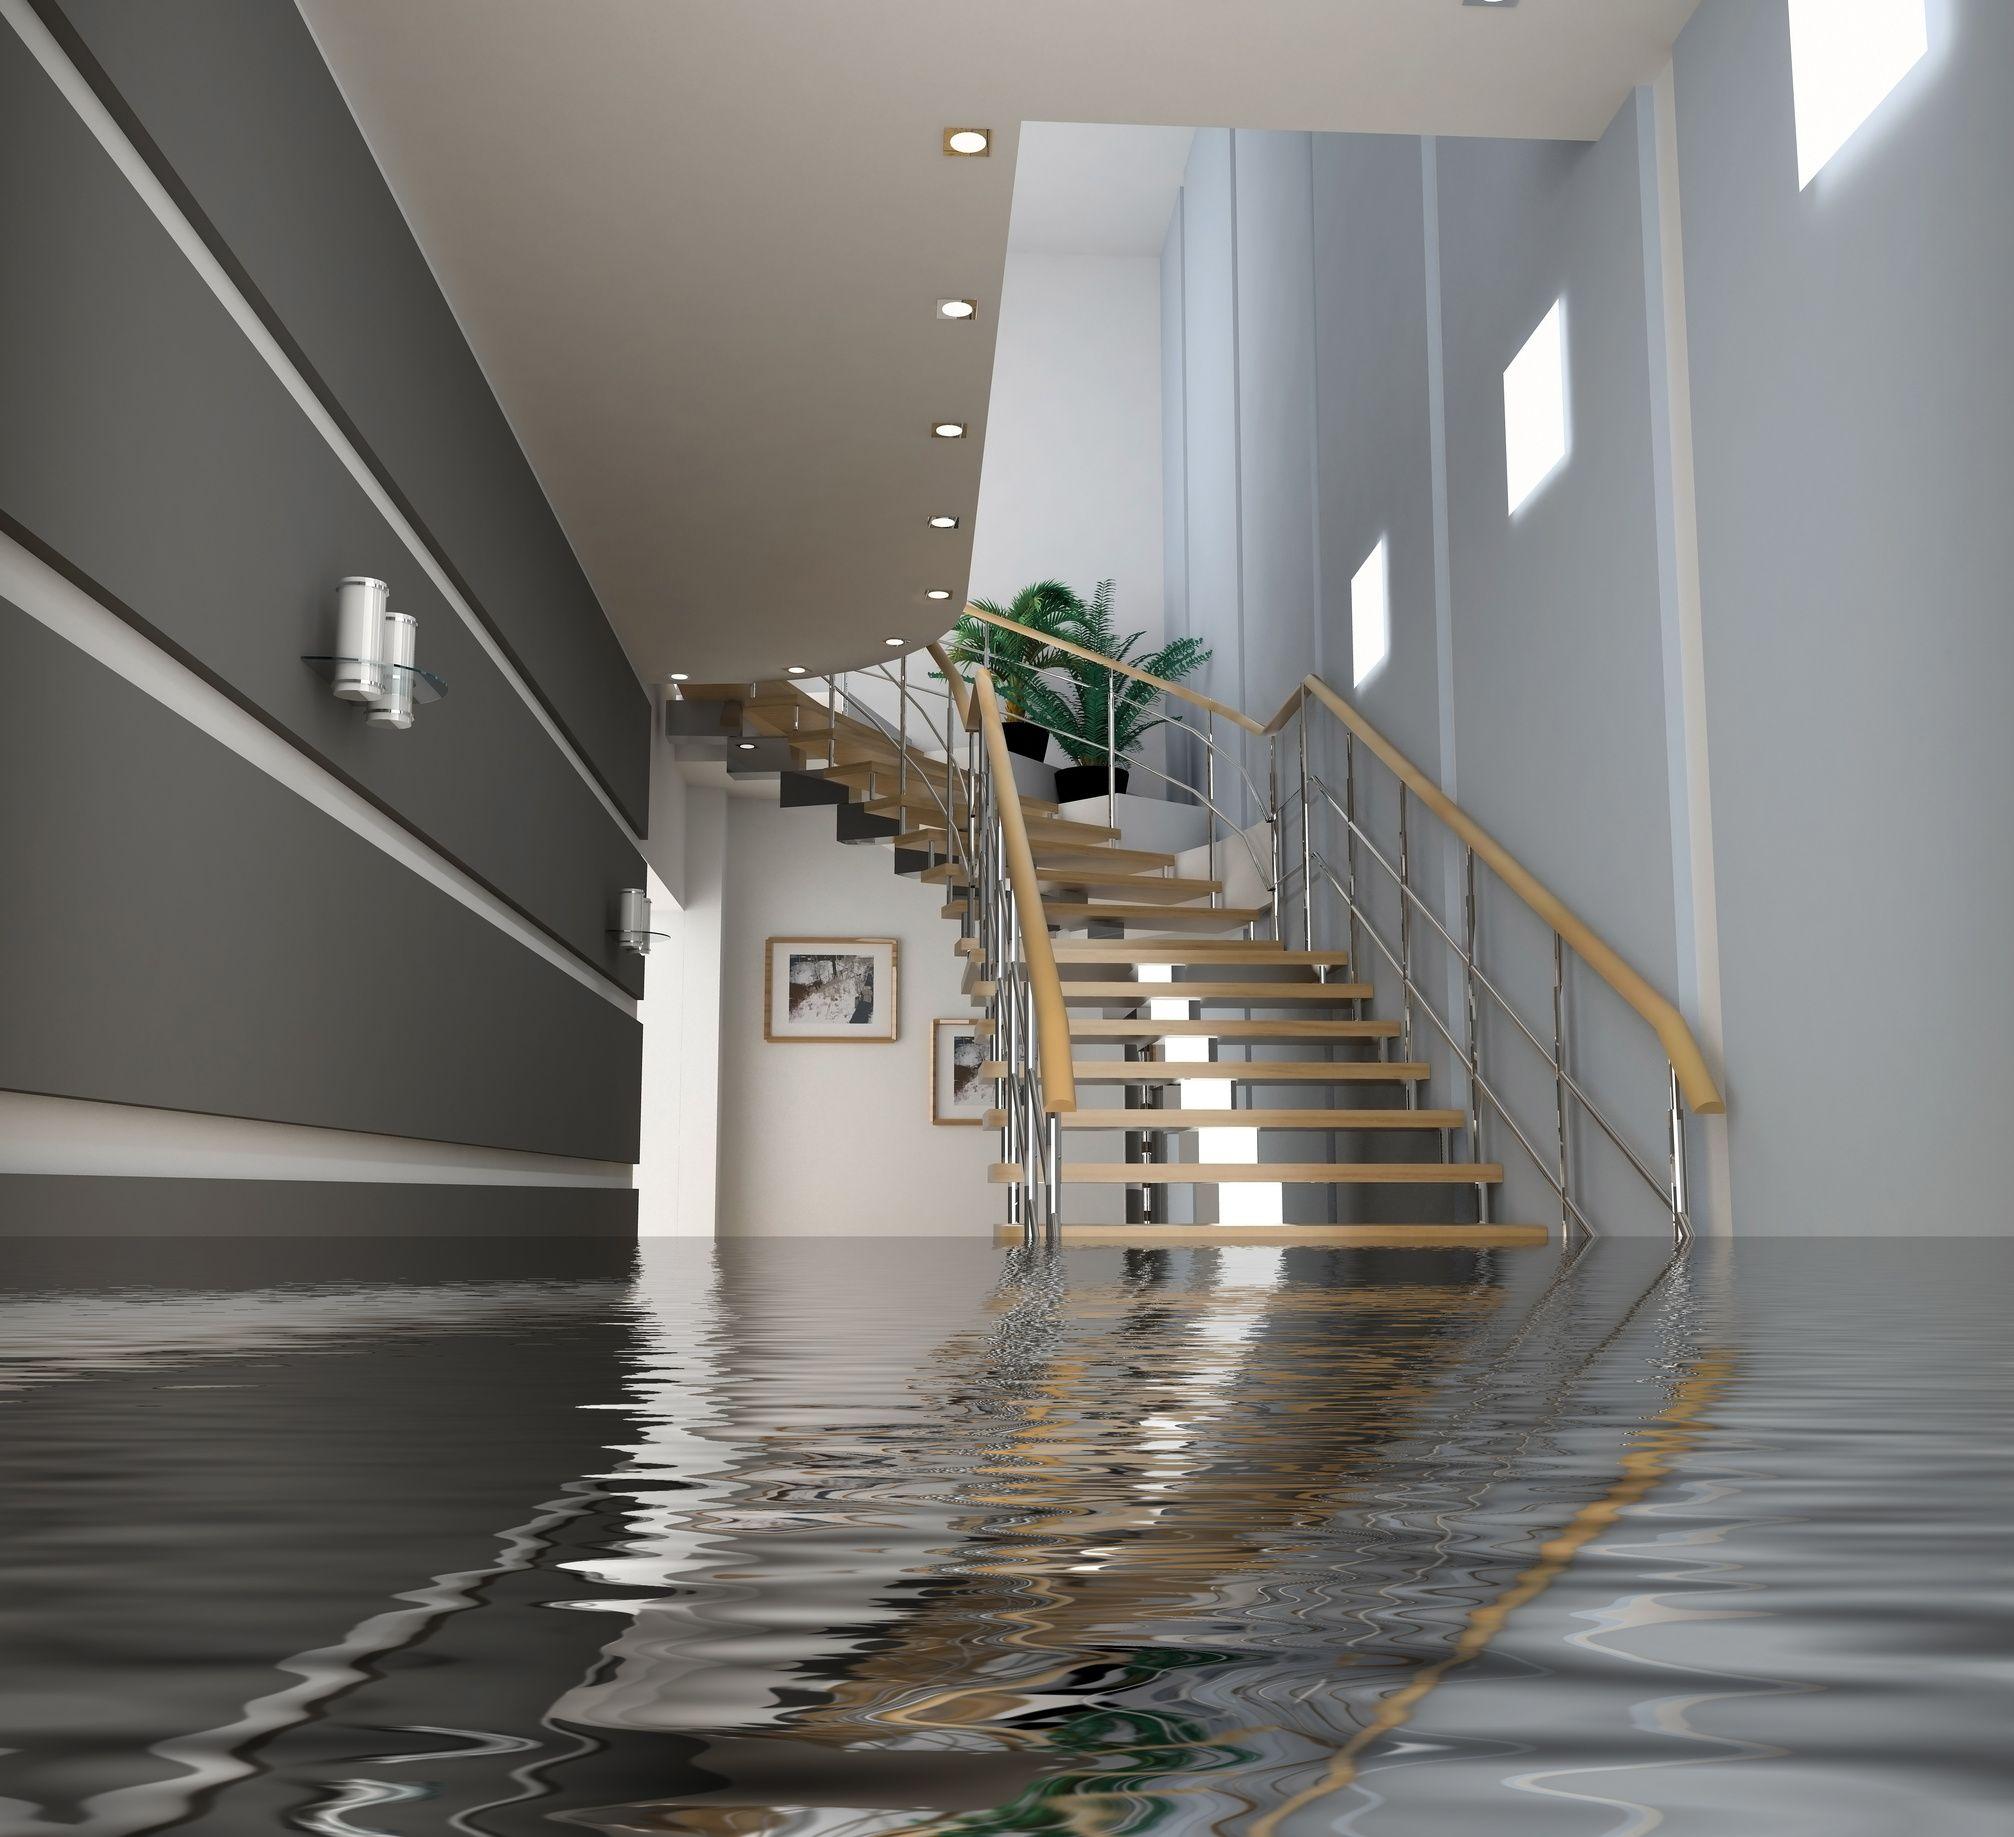 Basement: Affordable Basement Flooding What To Do Basement ...